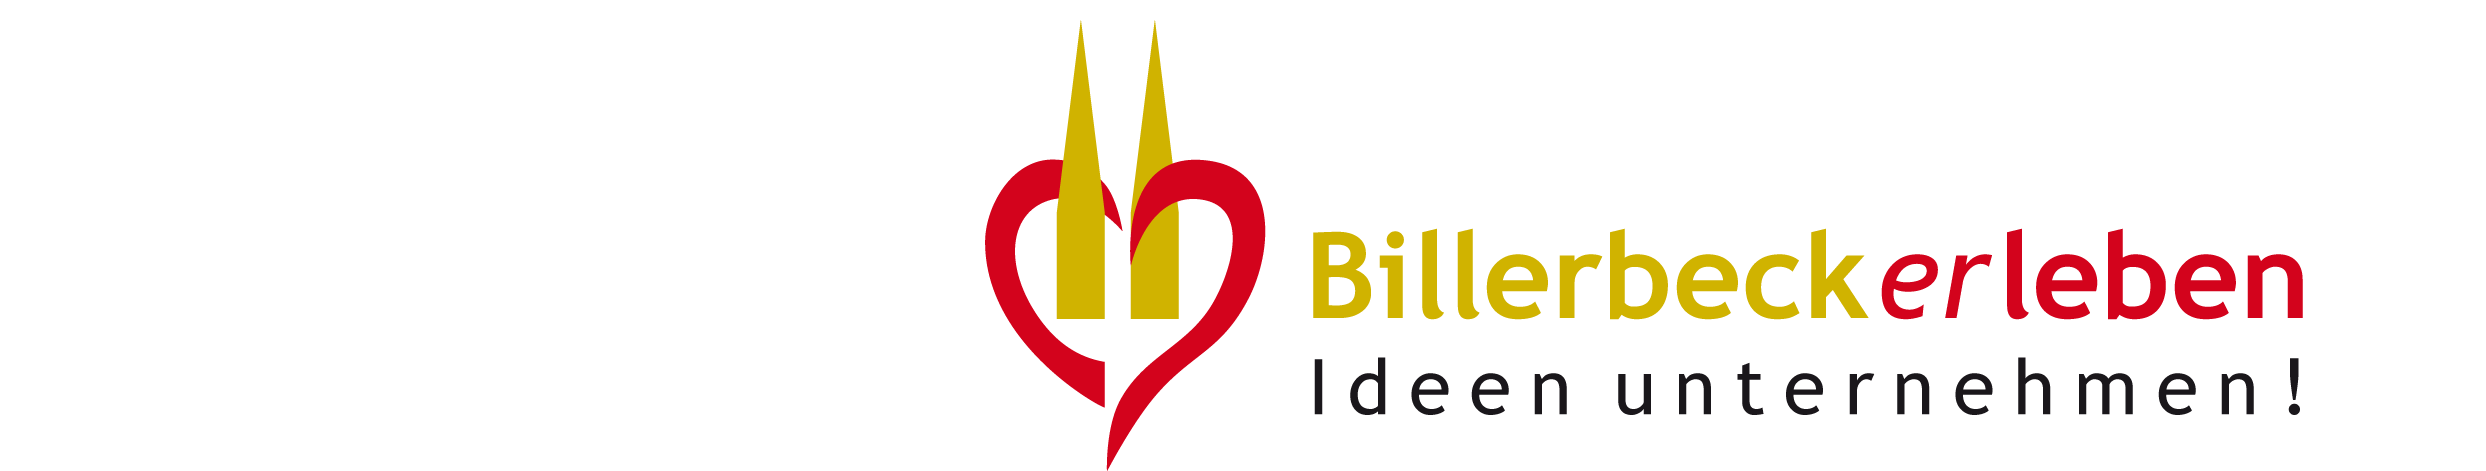 billerbeckerleben - Ideen unternehmen! Logo